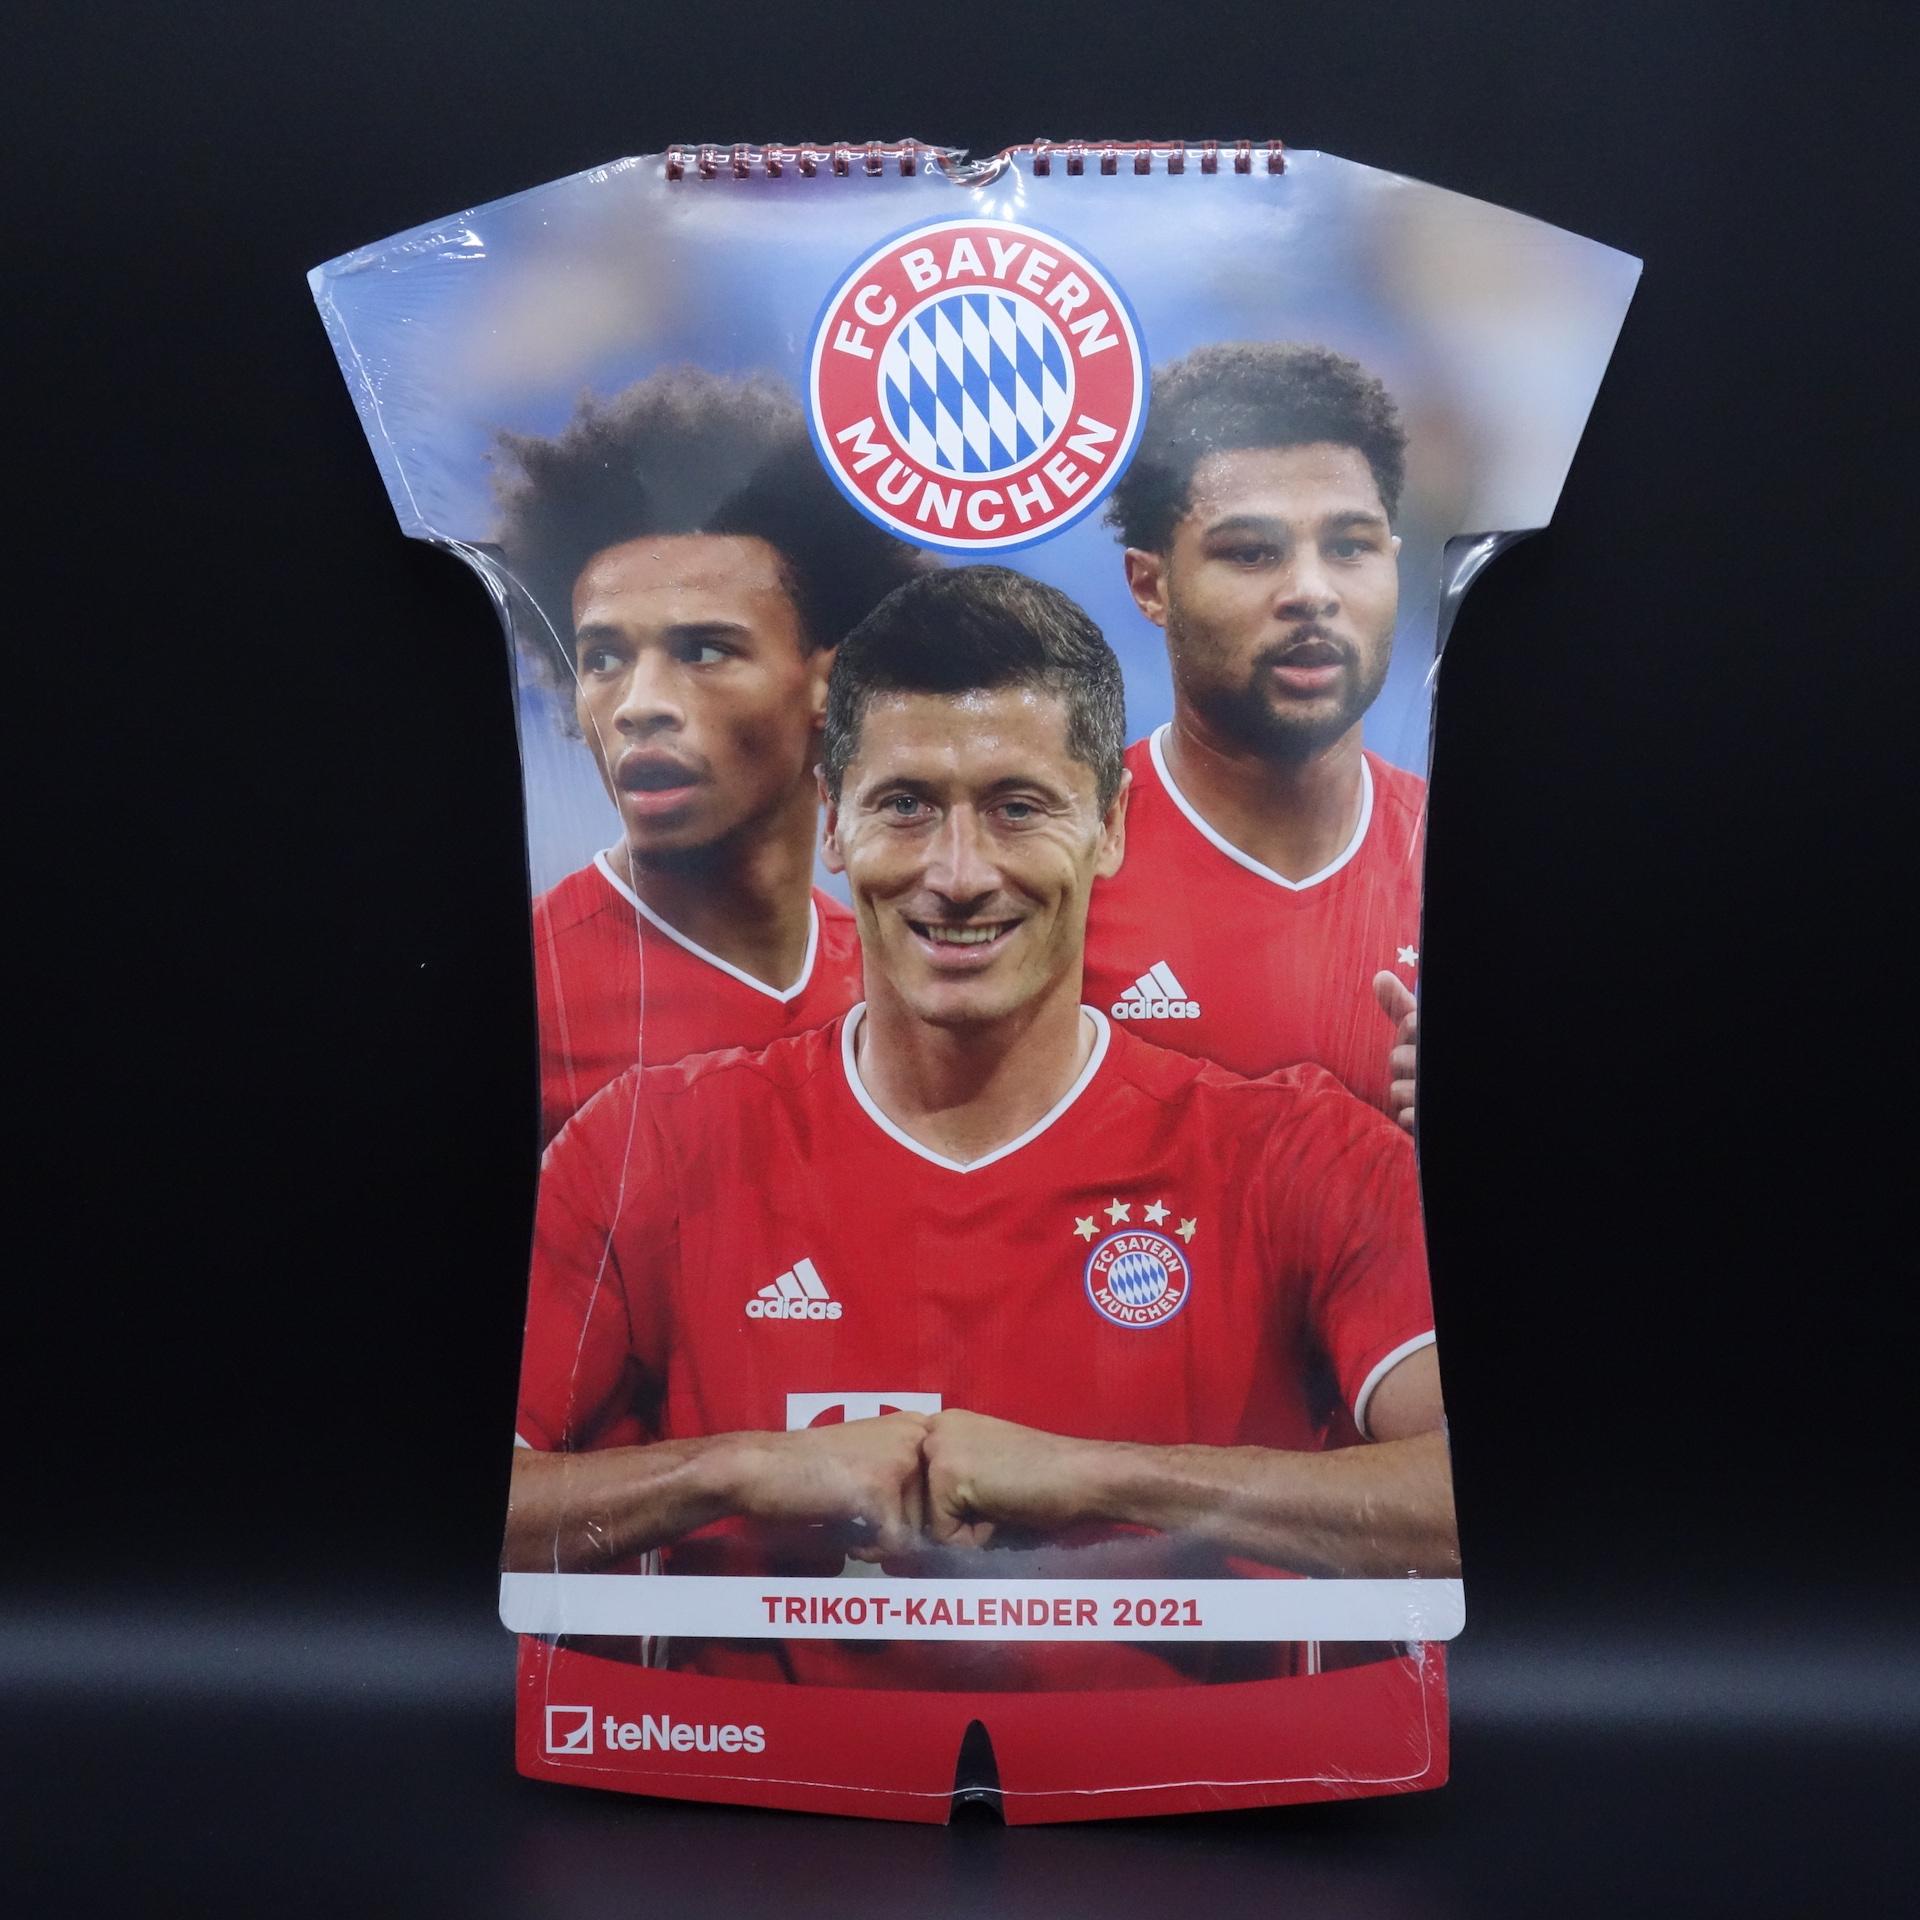 FC Bayern München Trikot-Kalender 2021